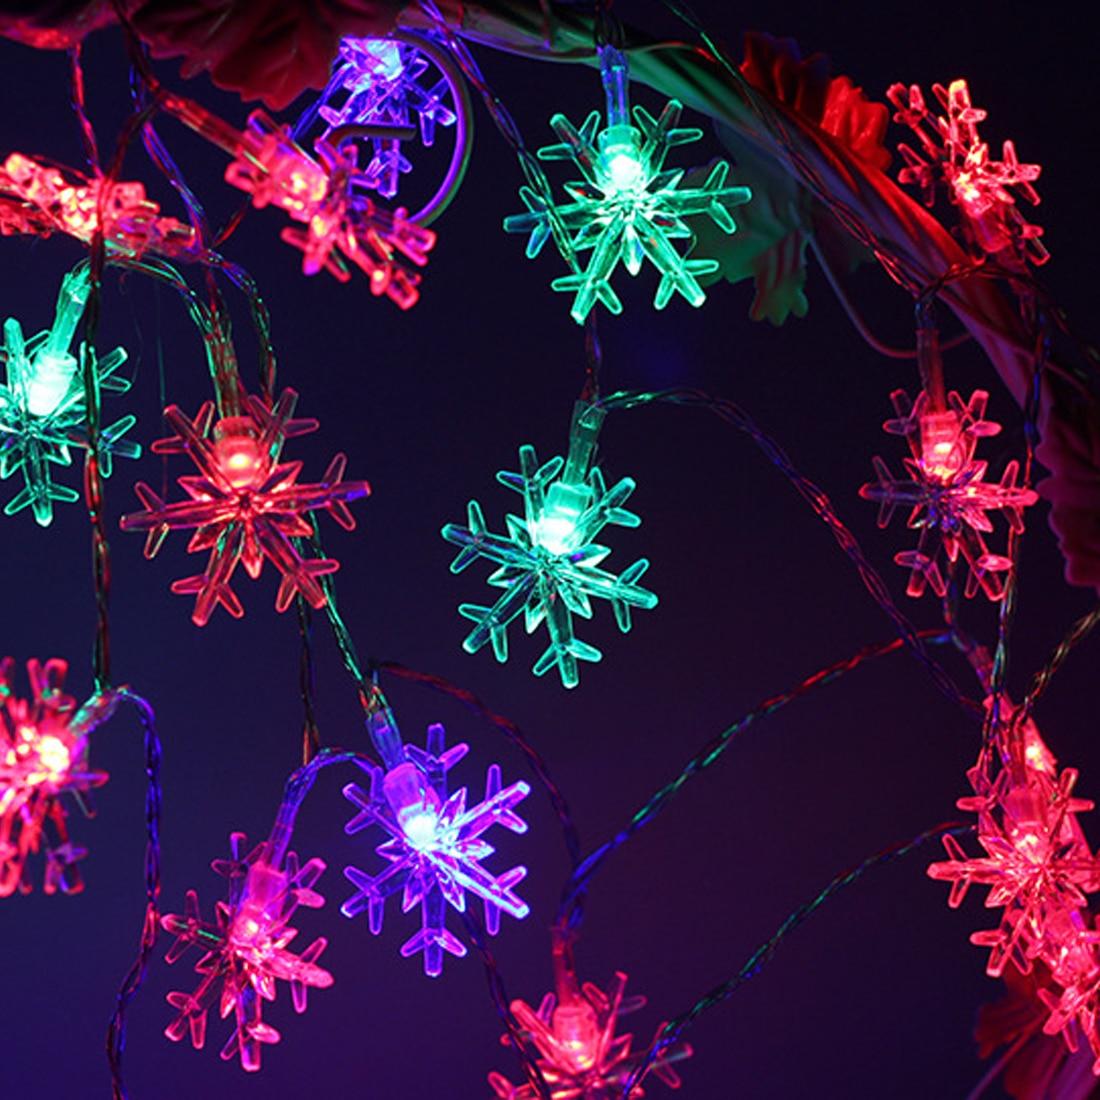 Amazing 1pcs Christmas Lights Outdoor 10m 100LED String Lights Garden Light for Home Wedding Party Decoration EU Plug